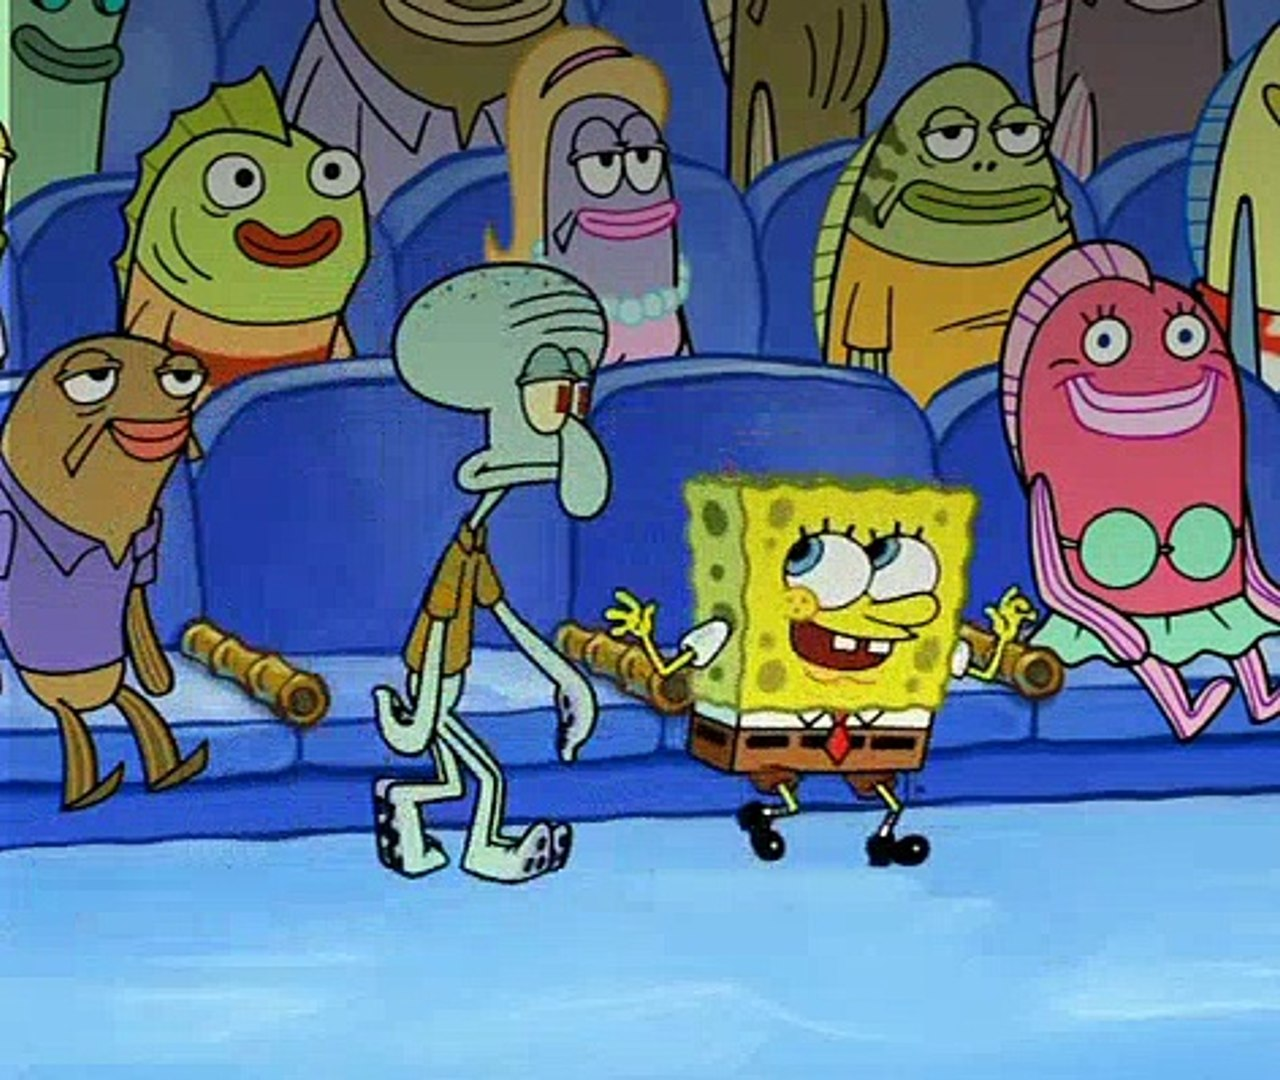 spongebob squarepants s09e29 are